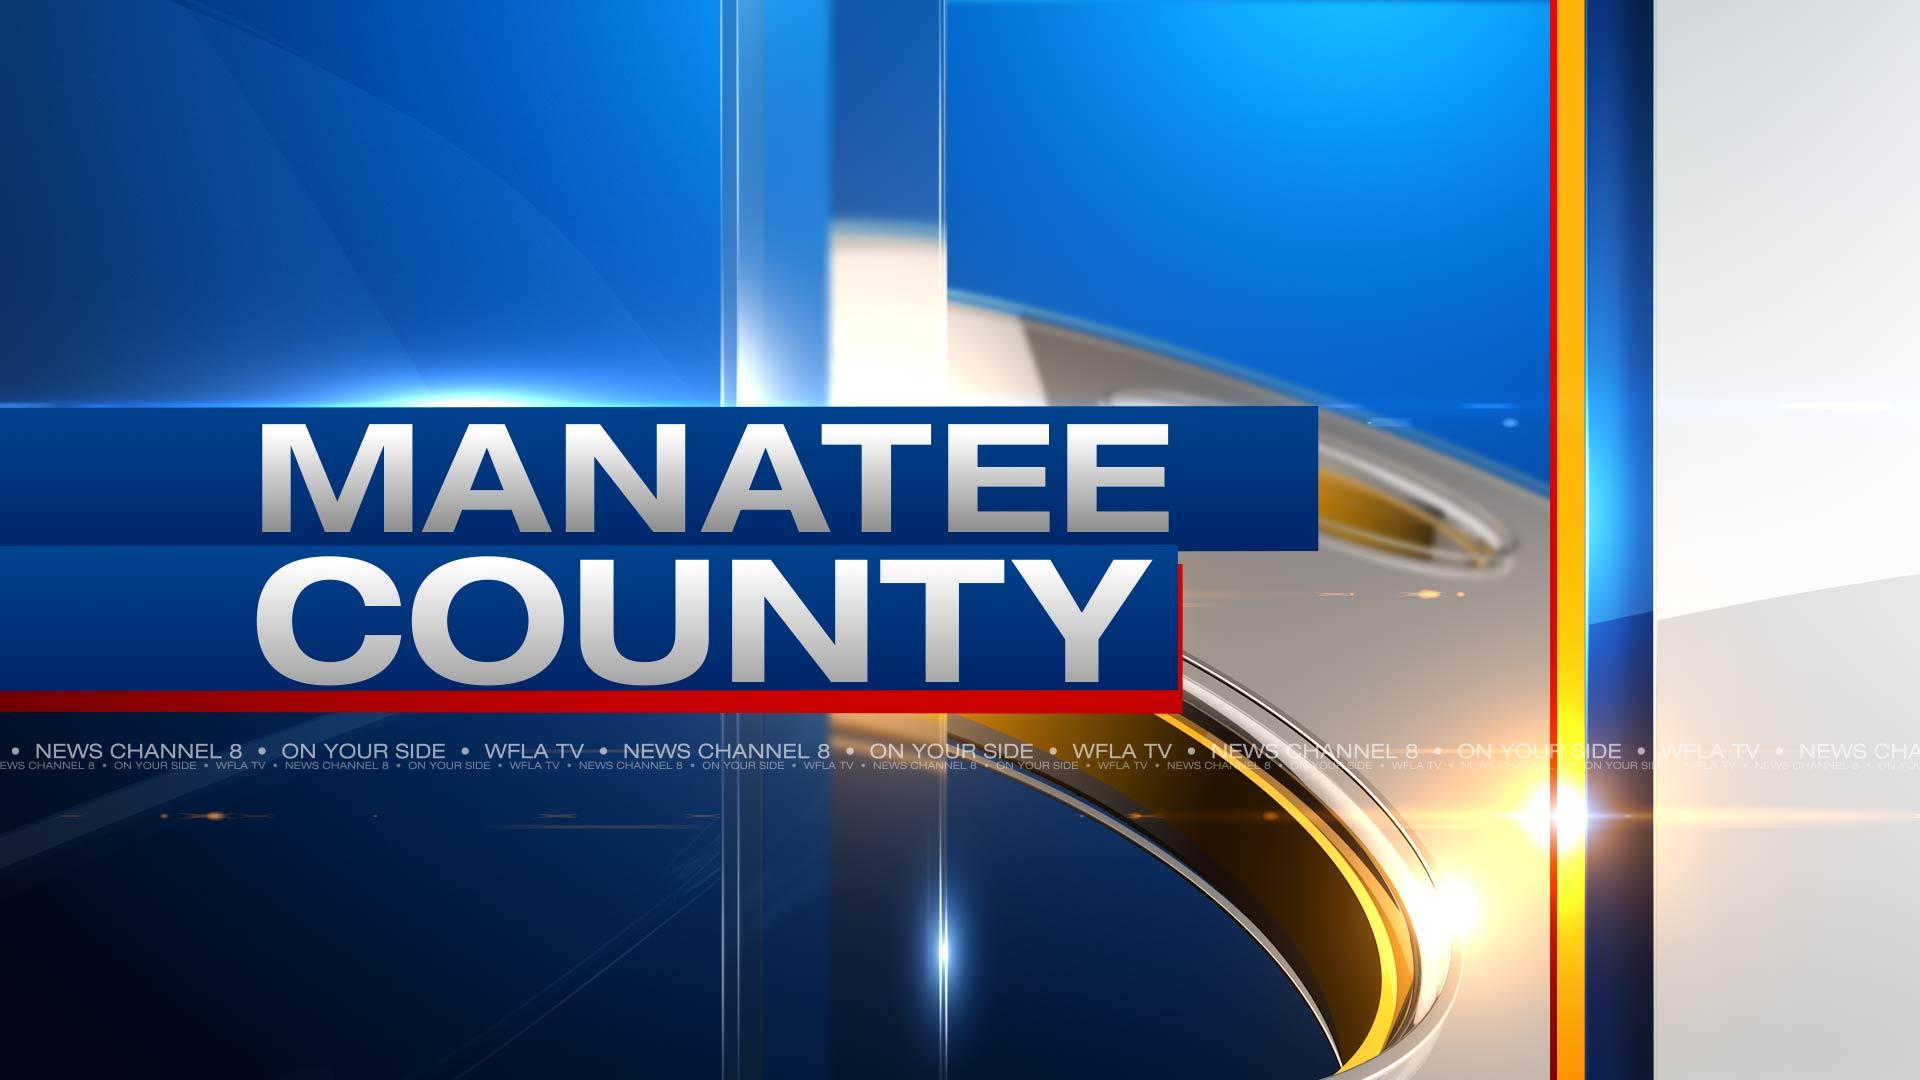 county-manatee_229990